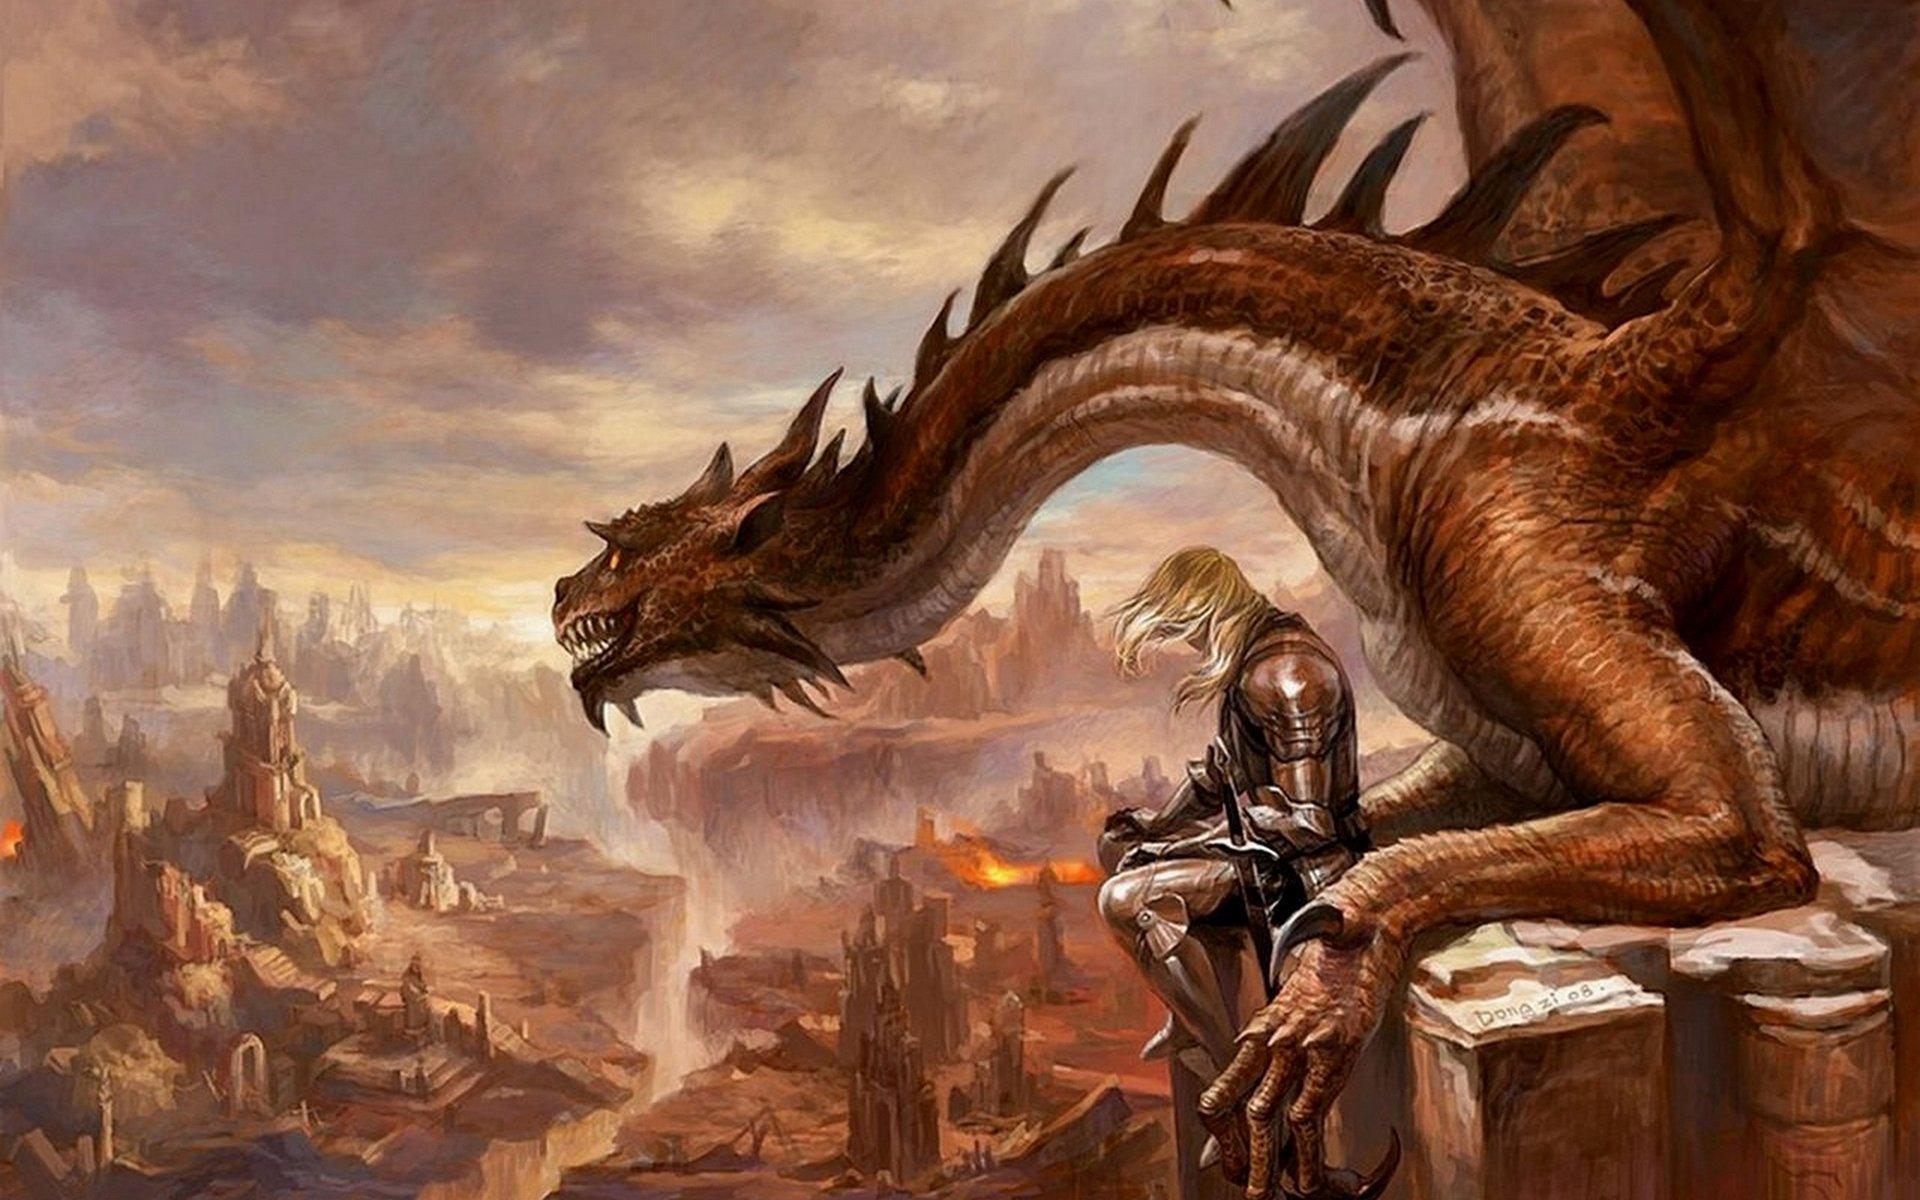 dragons fantasy wallpaper 1920x1200 - photo #15